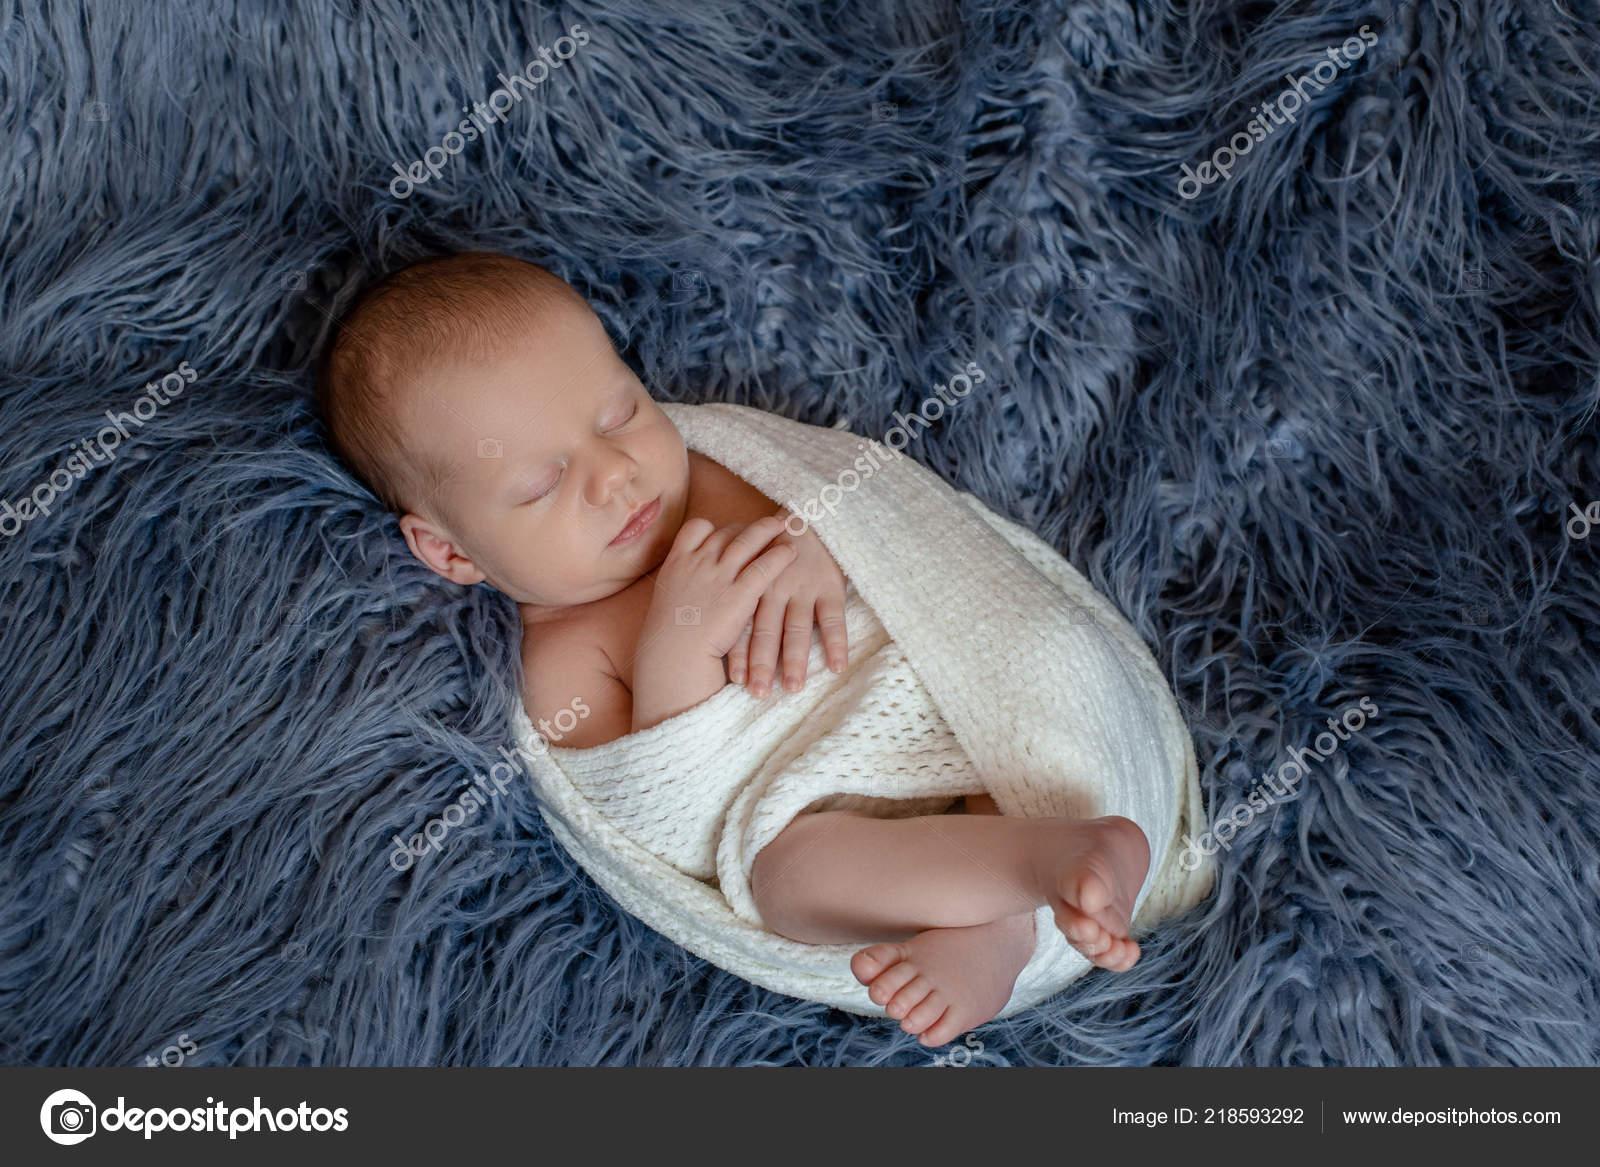 5b9f64407f54 Newborn baby boy in bed. New born child sleeping under a white ...